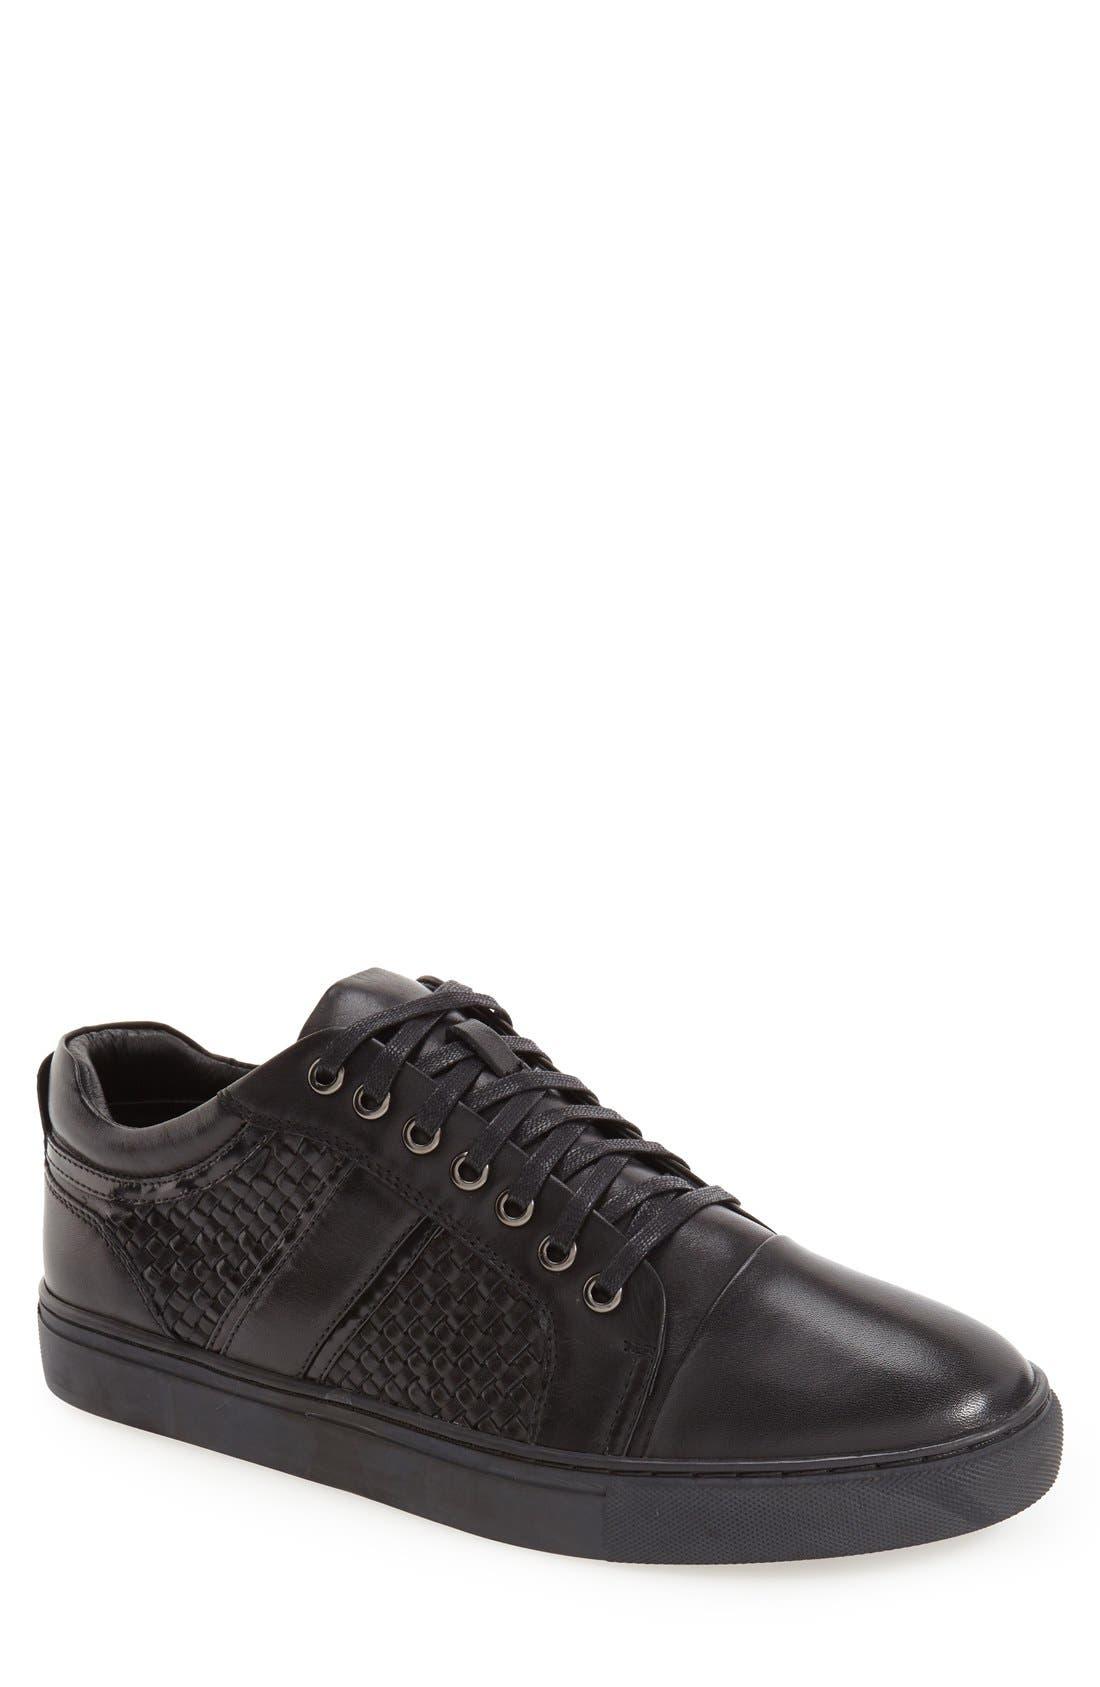 'Rhythm' Woven Sneaker,                             Main thumbnail 1, color,                             001